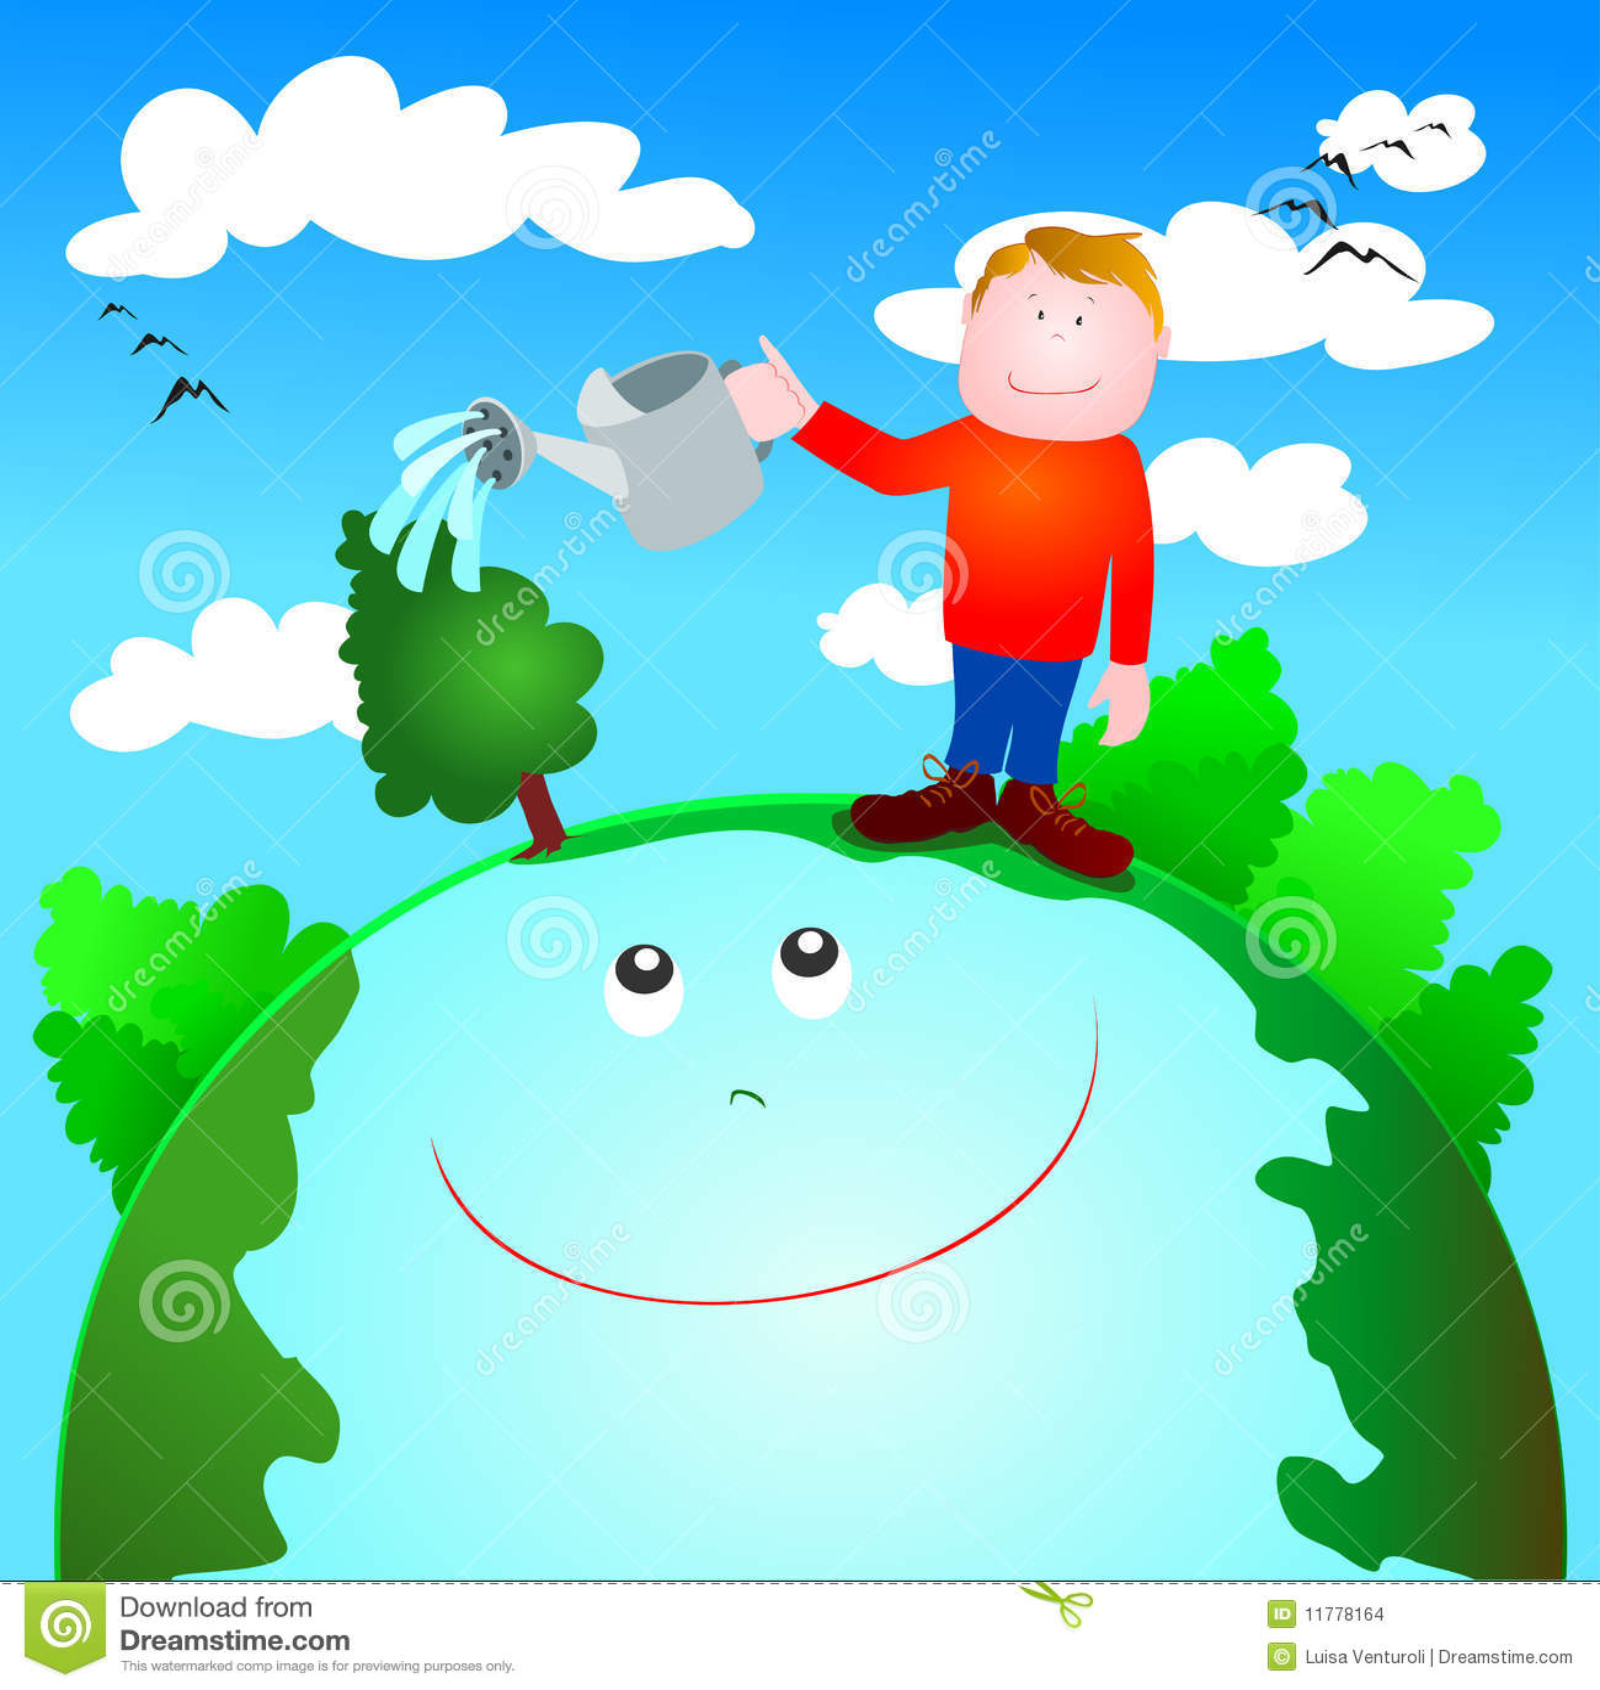 Green Environmental Protection